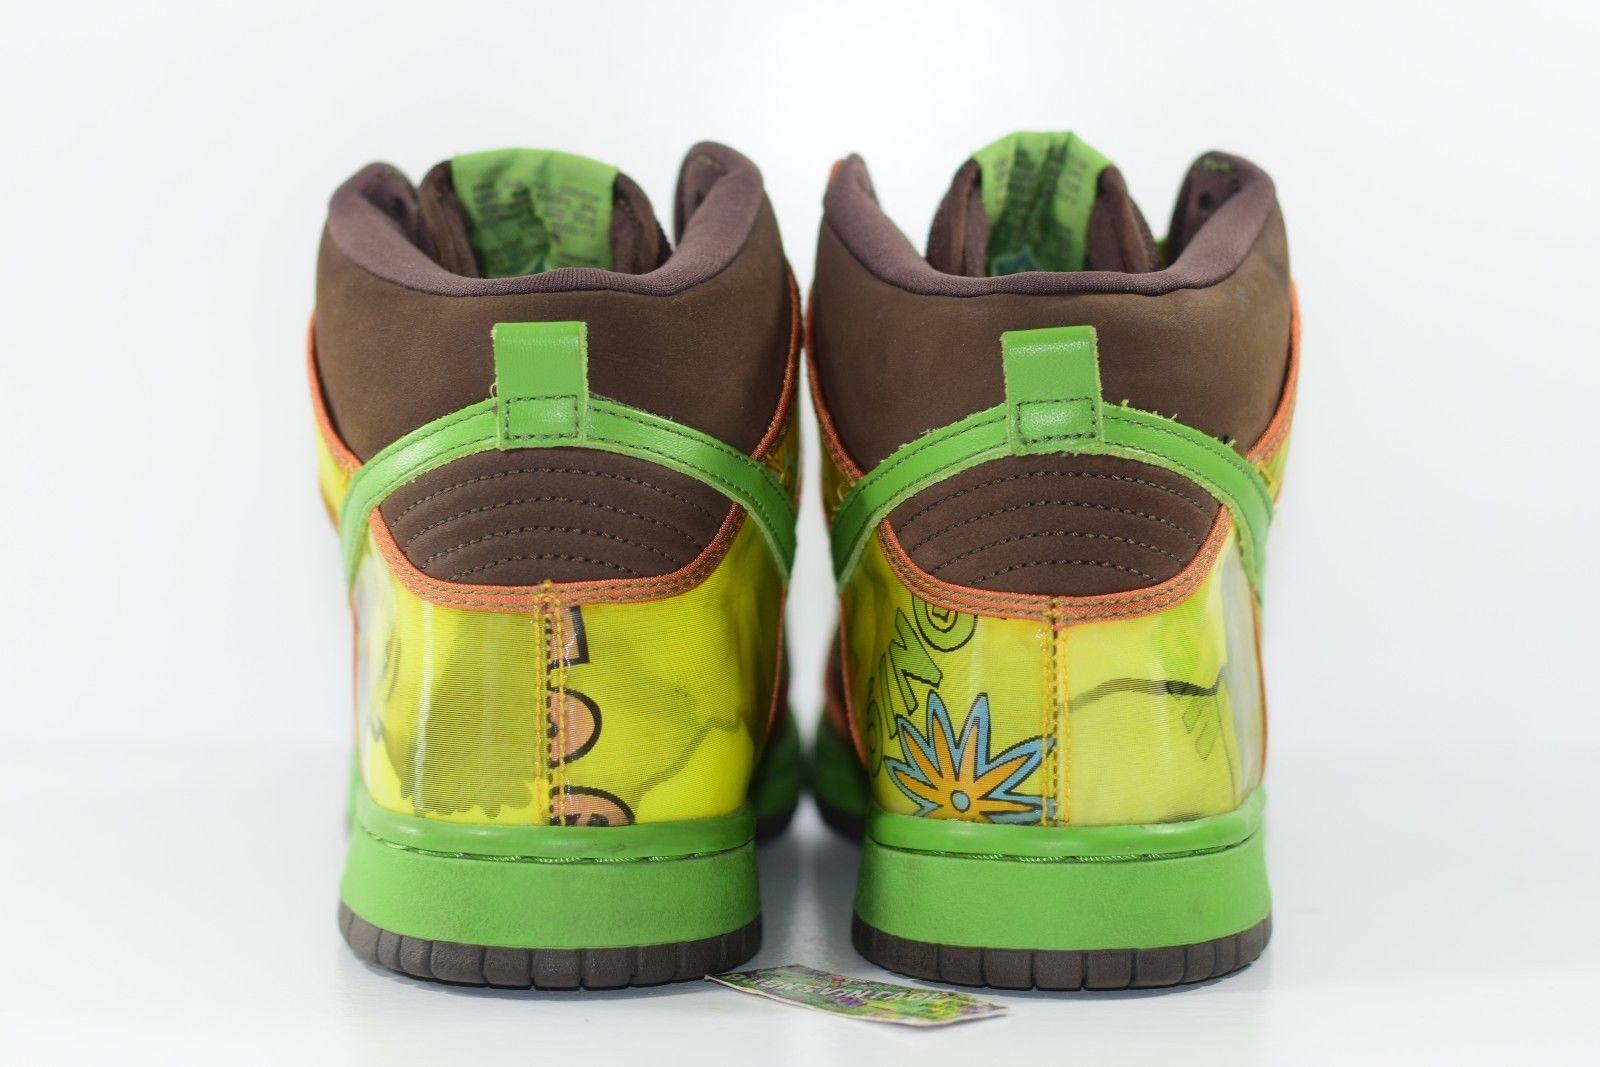 reputable site ec60a c5949 Size 10 | 2005 Nike Dunk Sb Hi